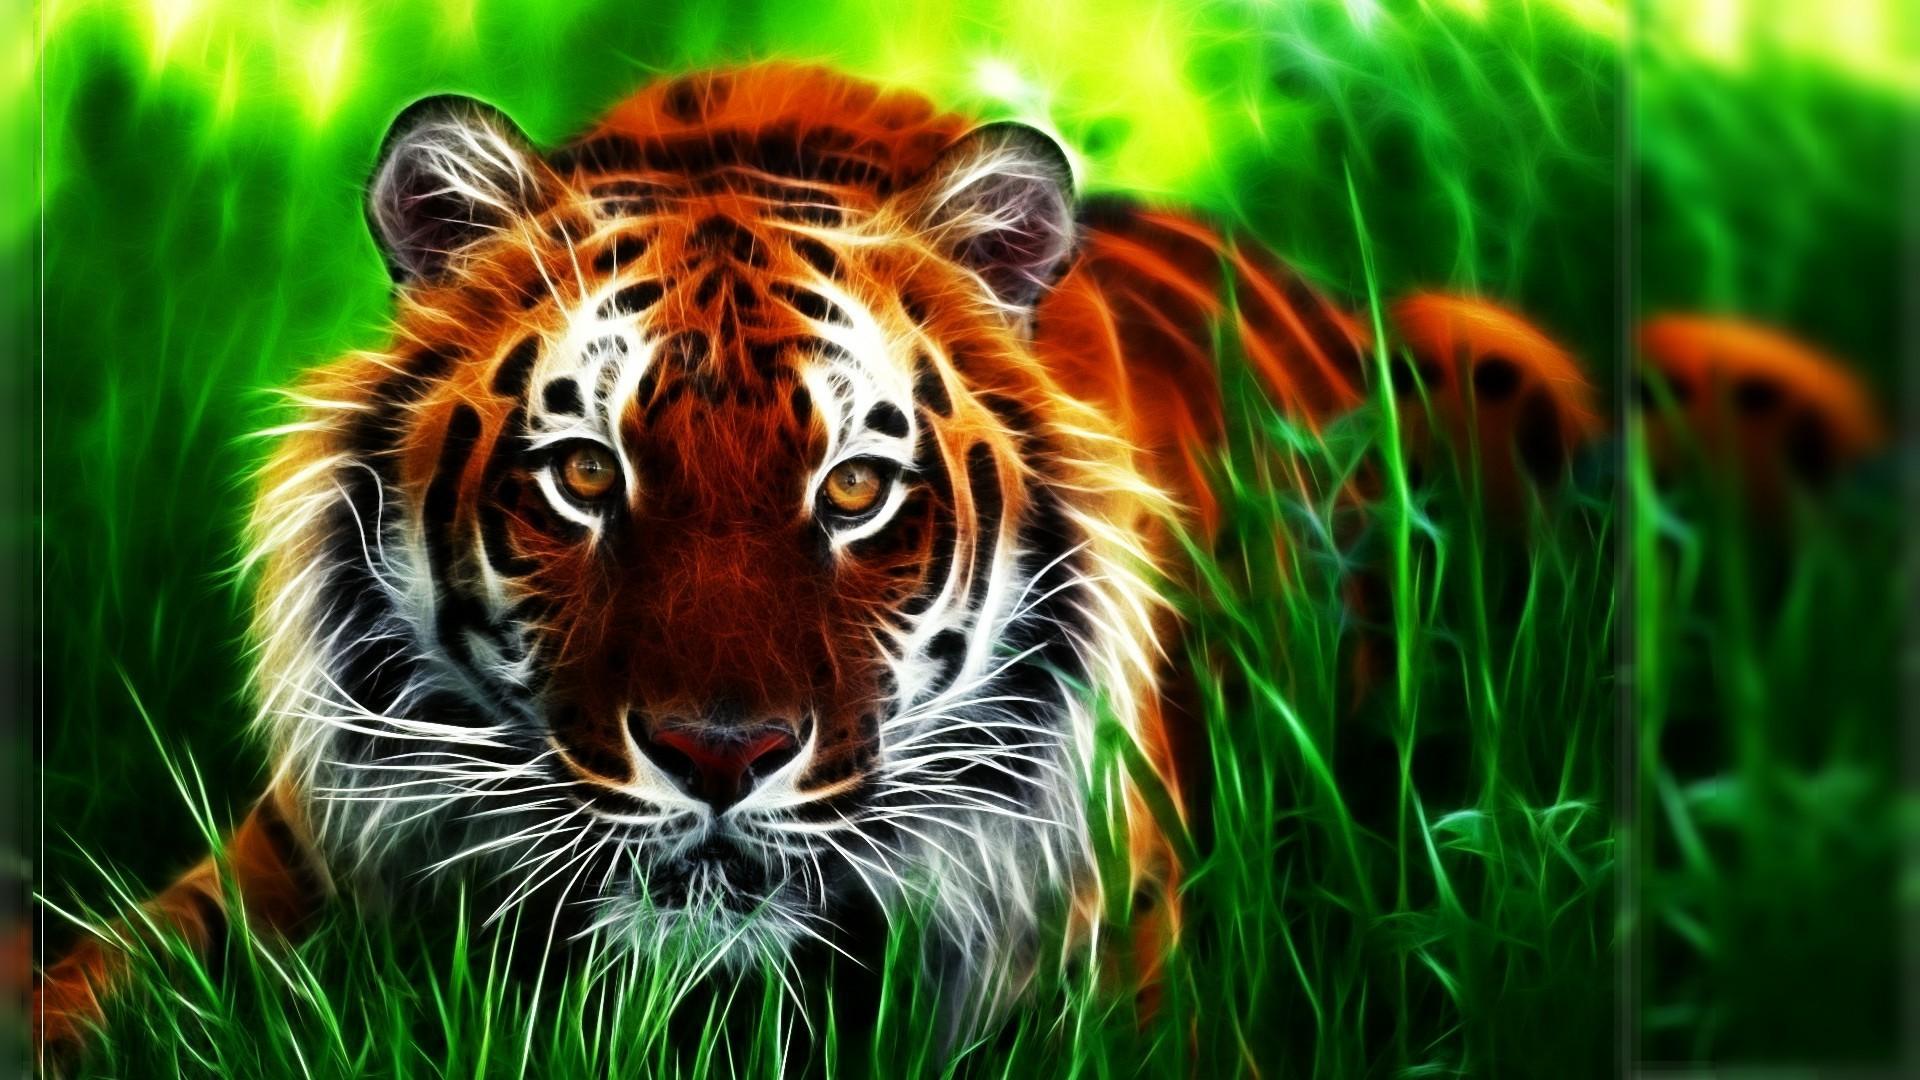 D Tiger Photoshop fractal wallpaper 960×640 Green Tiger Wallpapers (43  Wallpapers)  